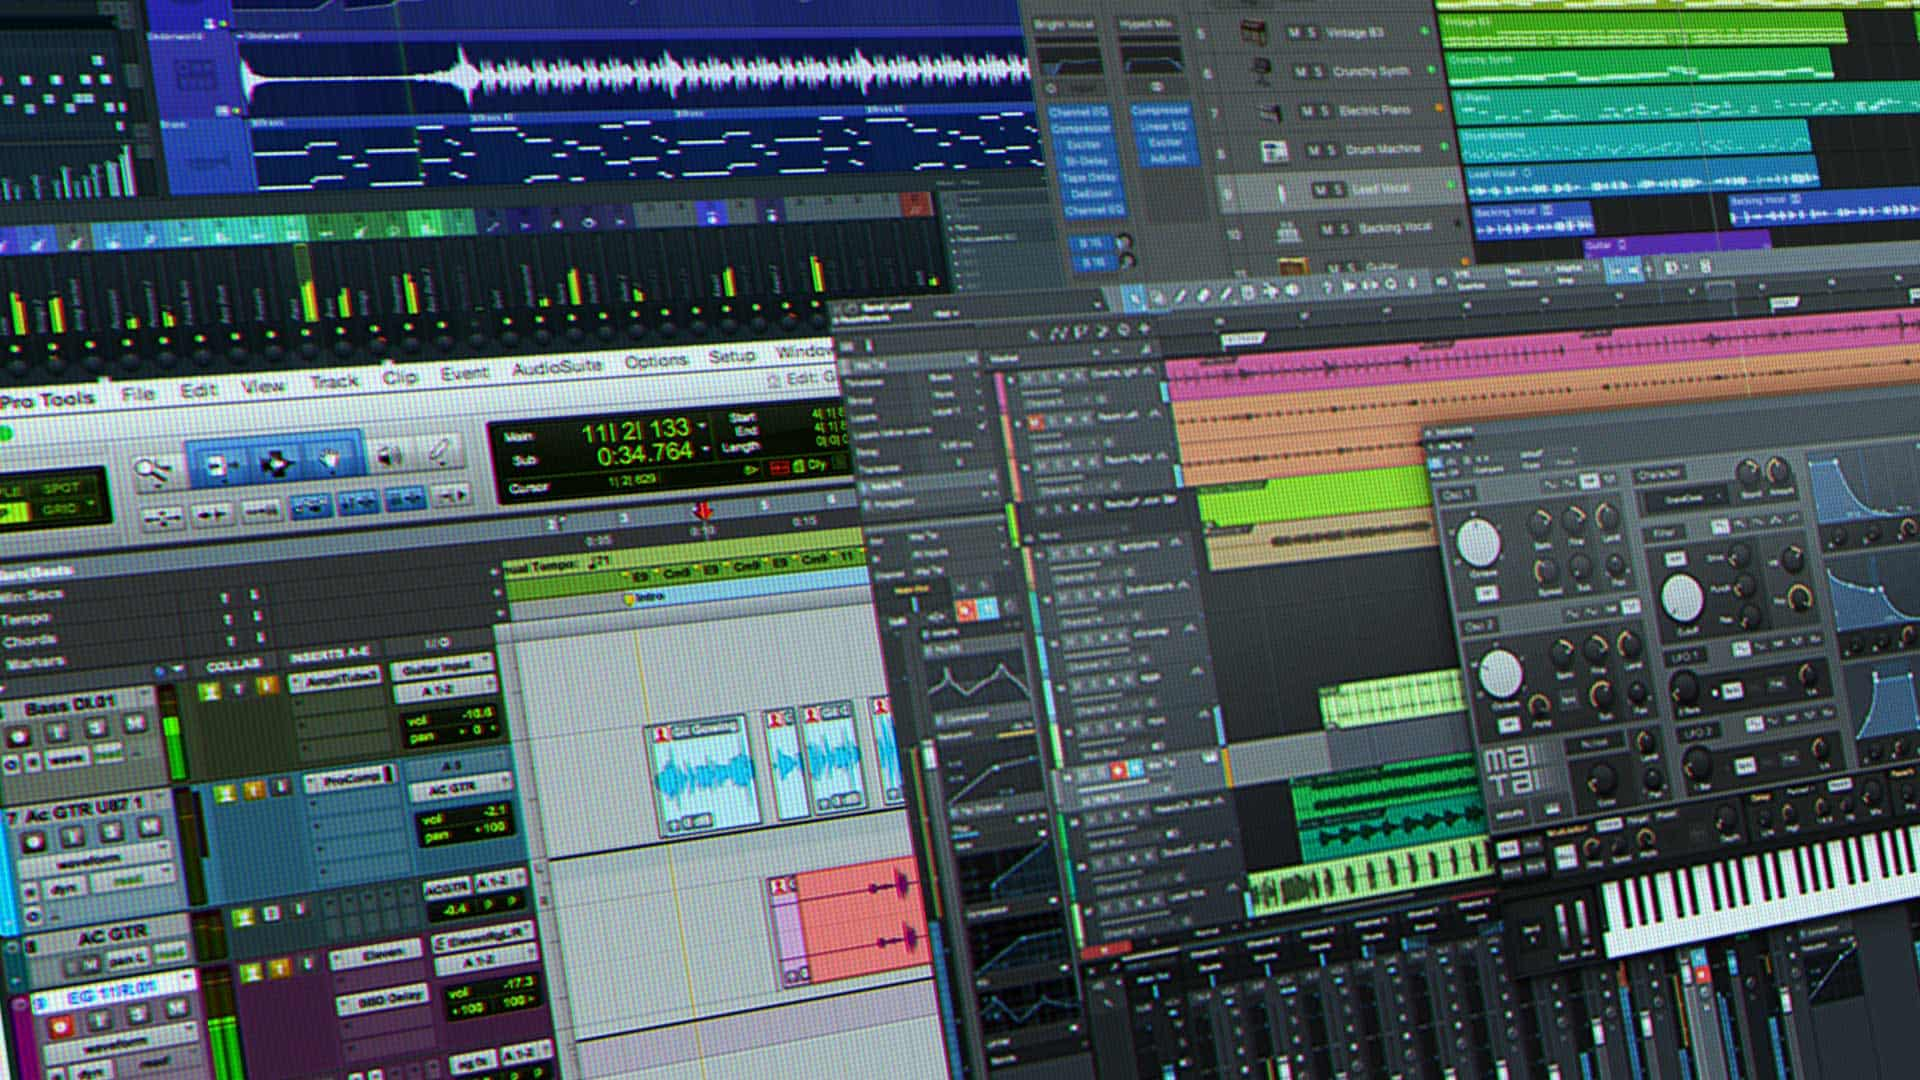 The-Complete-DAW-Digital-Audio-Workstation-Software-List.jpg